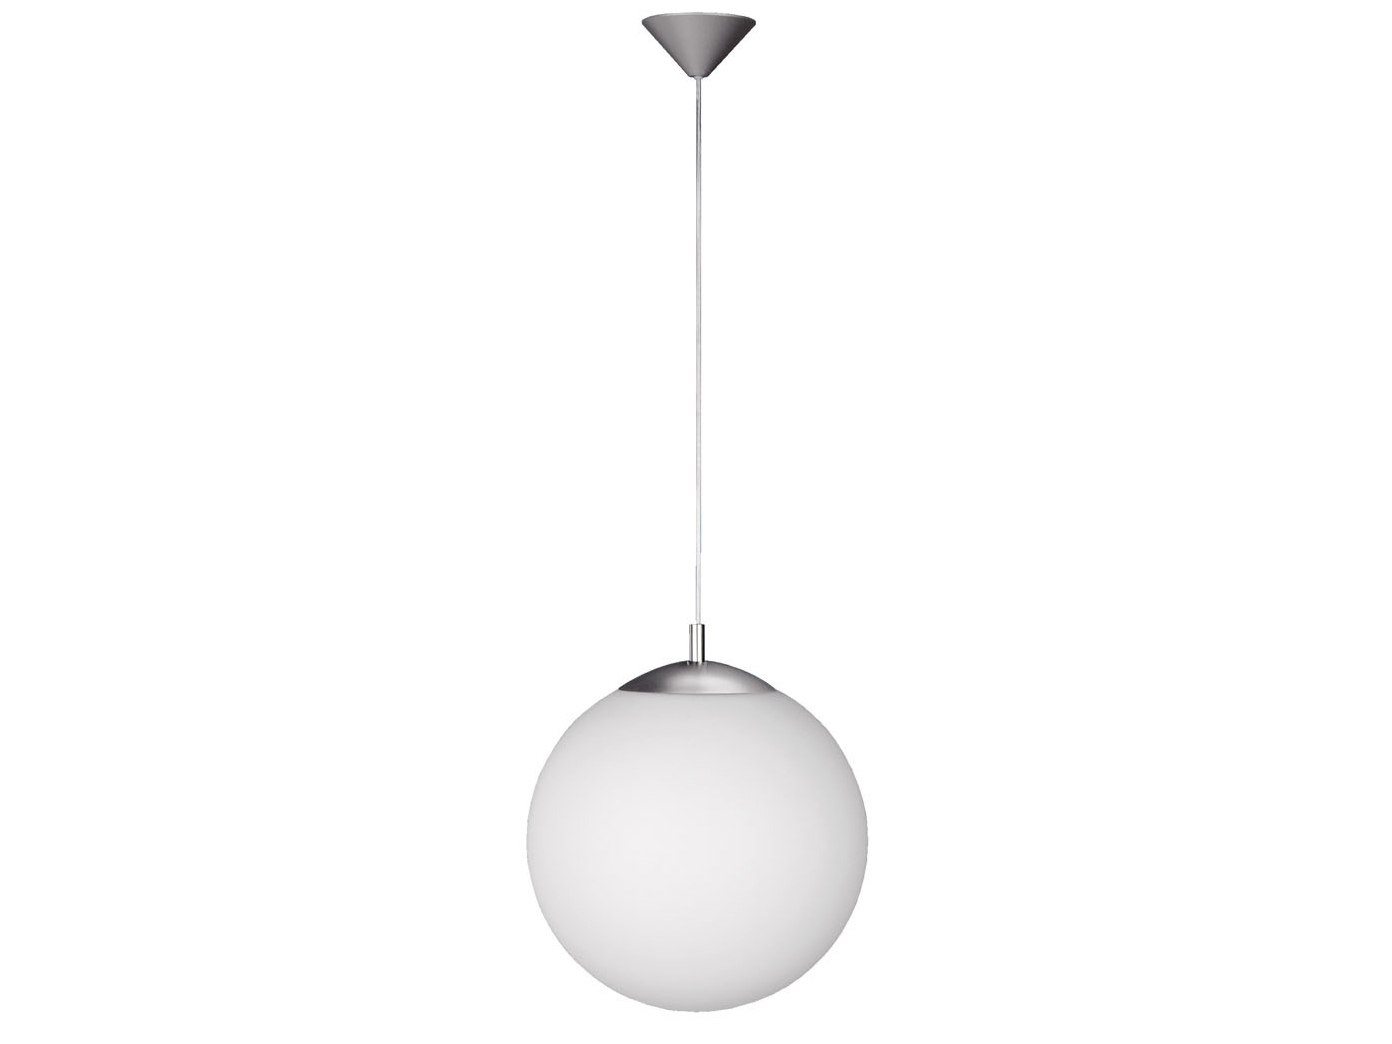 kugel pendelleuchte 35 cm glas opalwei wofi leuchten. Black Bedroom Furniture Sets. Home Design Ideas